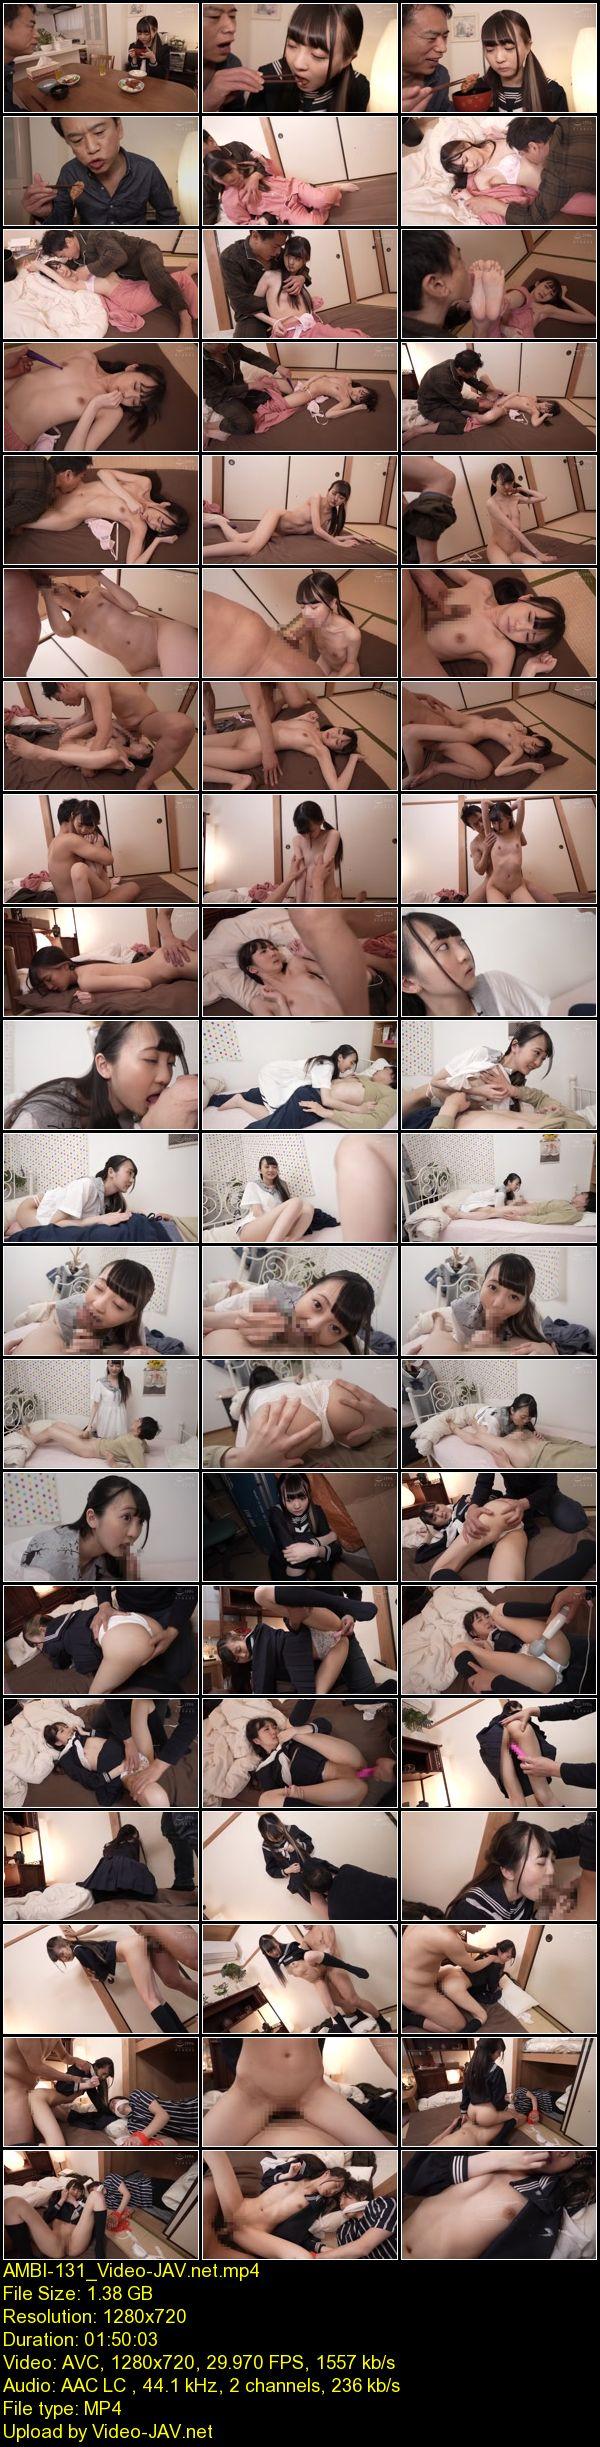 JAV Download Remu Hayami [AMBI 131] 鬼畜父の性玩具 彼氏との仲を引き裂かれた制服美少女 早美れむ 2021 07 01